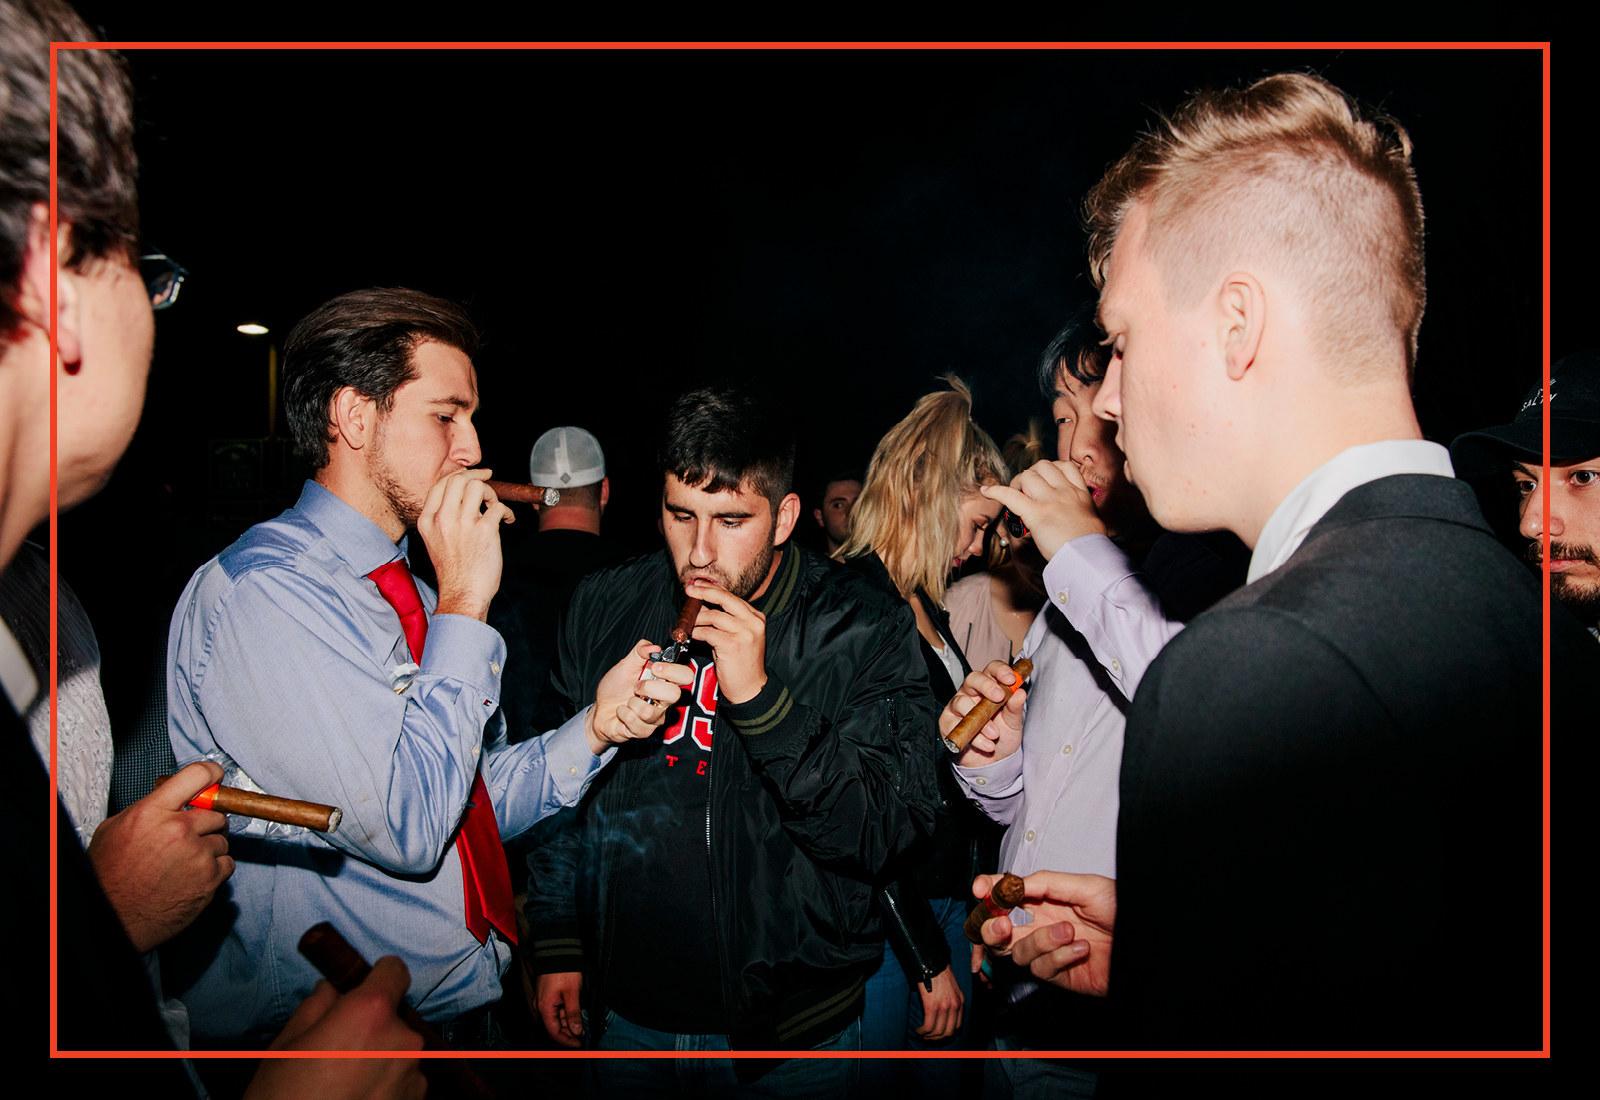 Meet The New California Counterculture: College Republicans